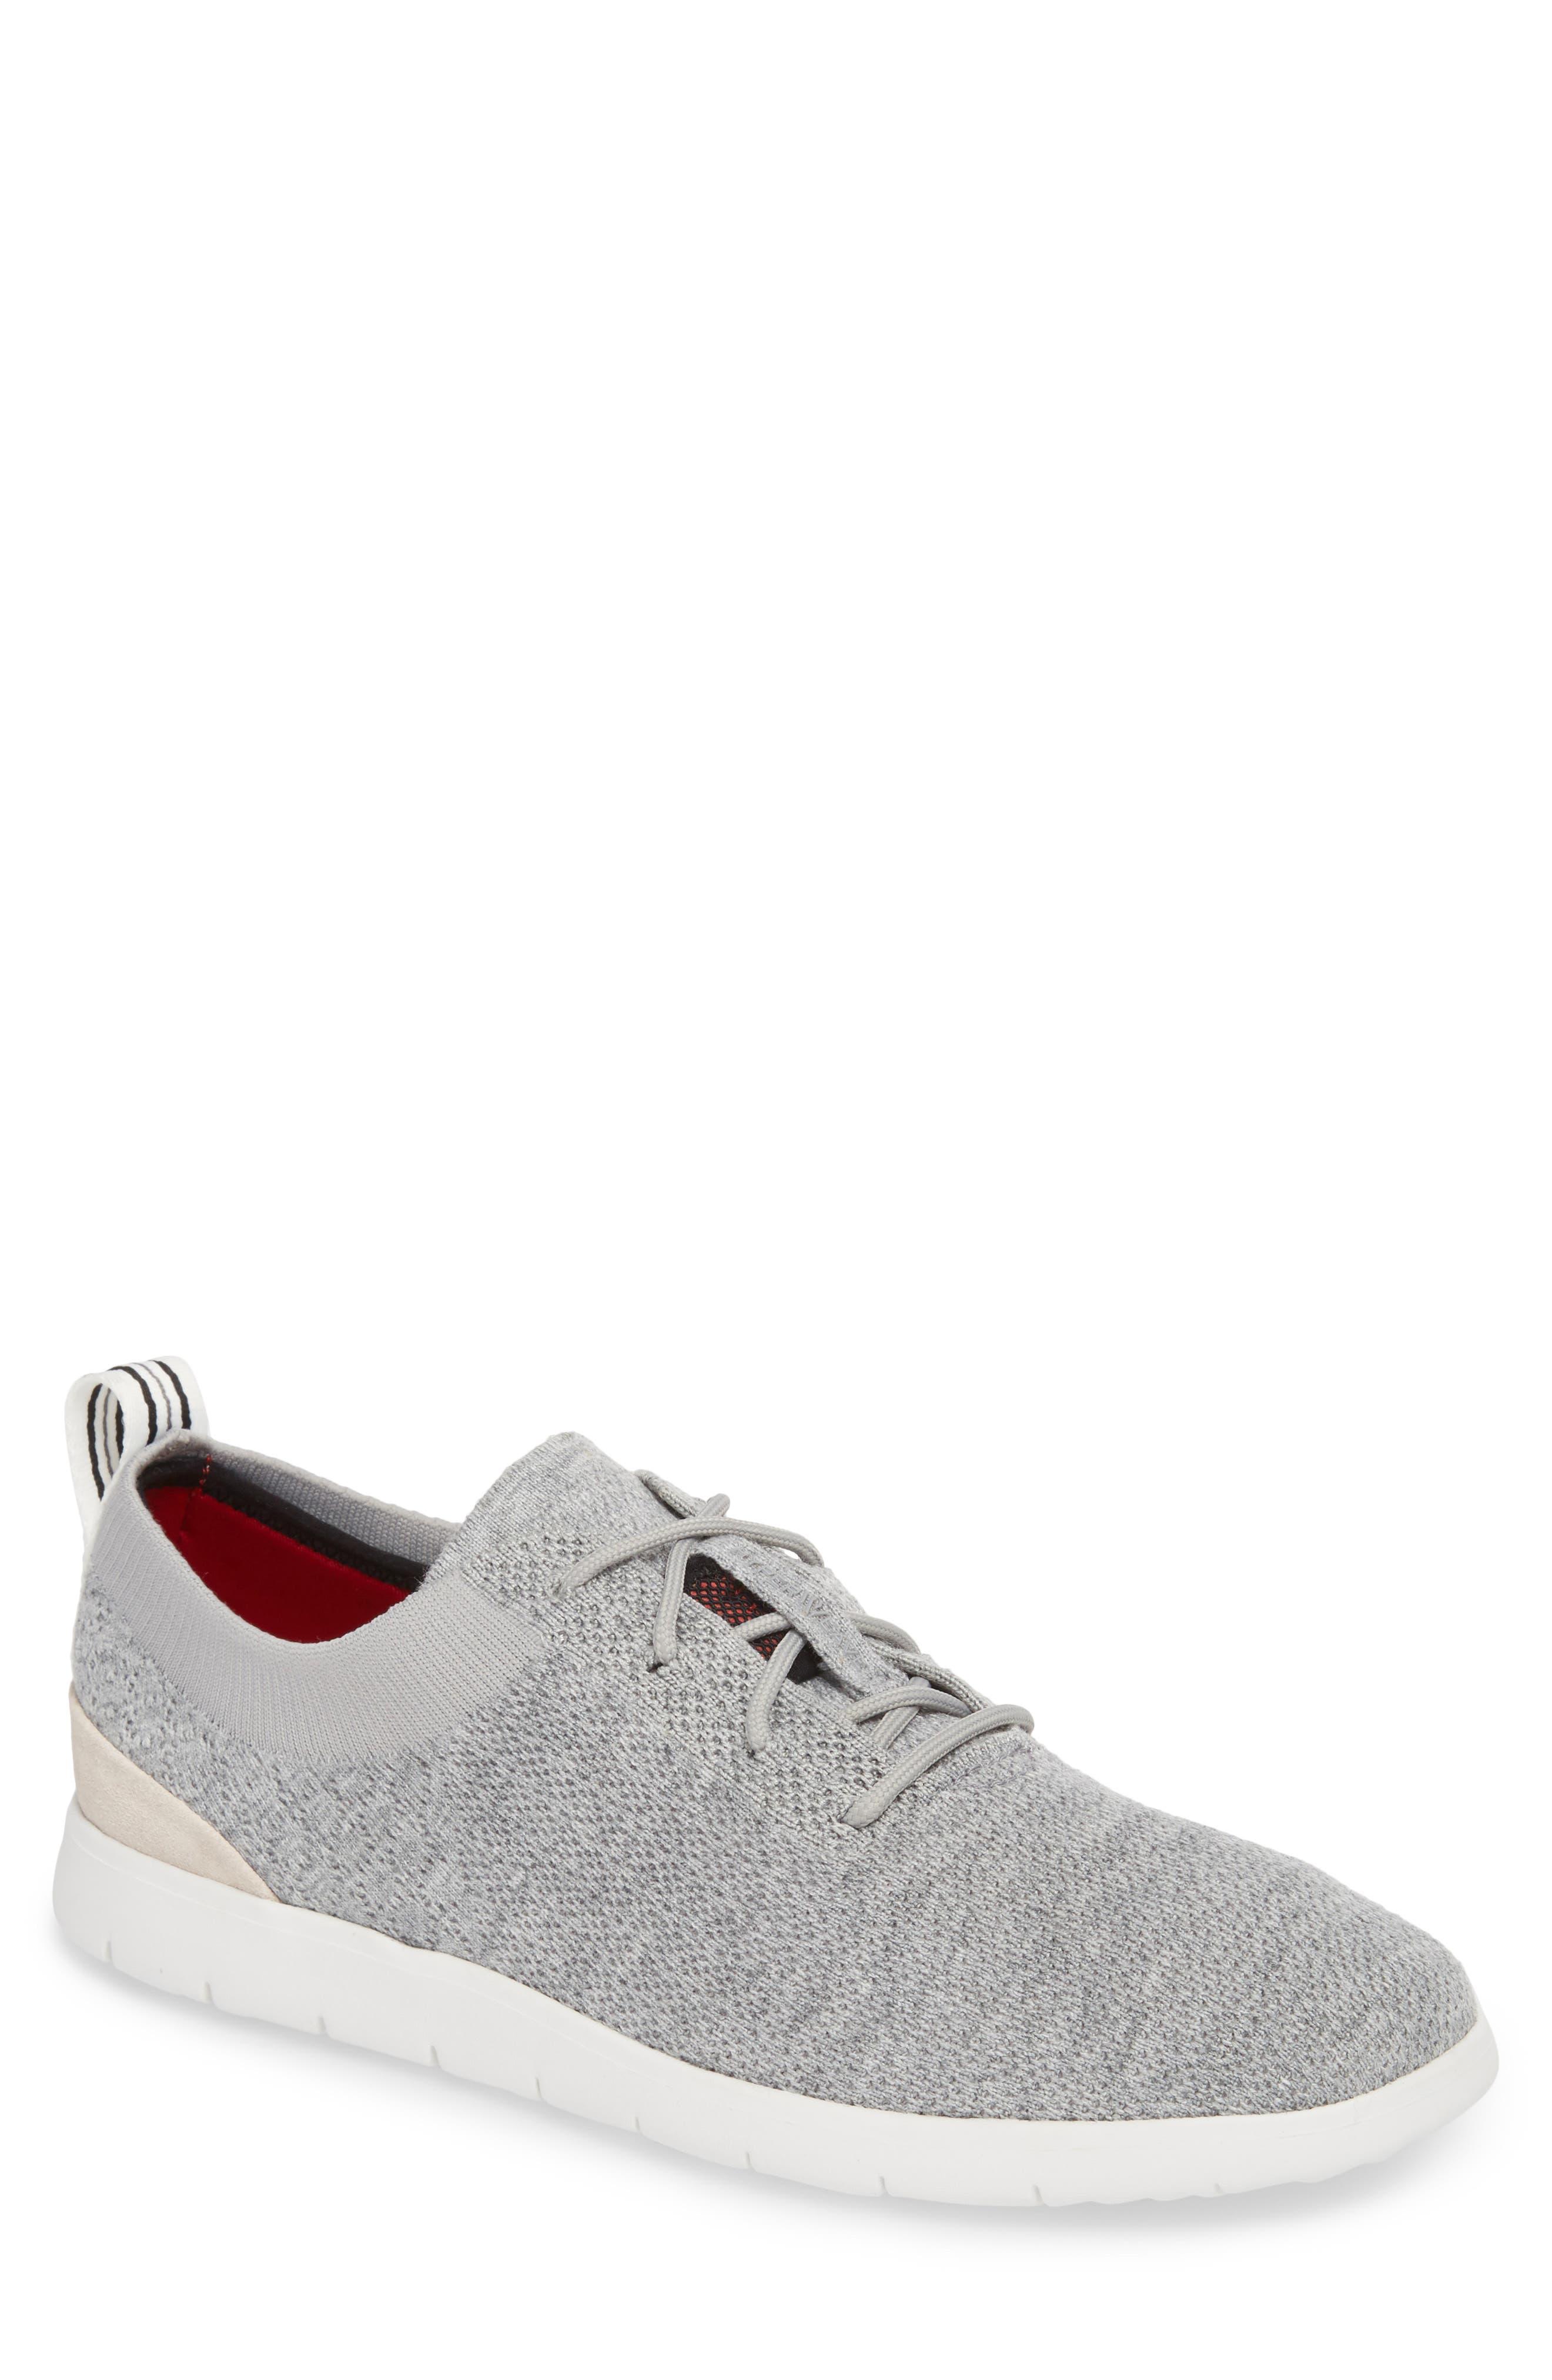 Feli HyperWeave Sneaker,                             Main thumbnail 1, color,                             Seal Leather